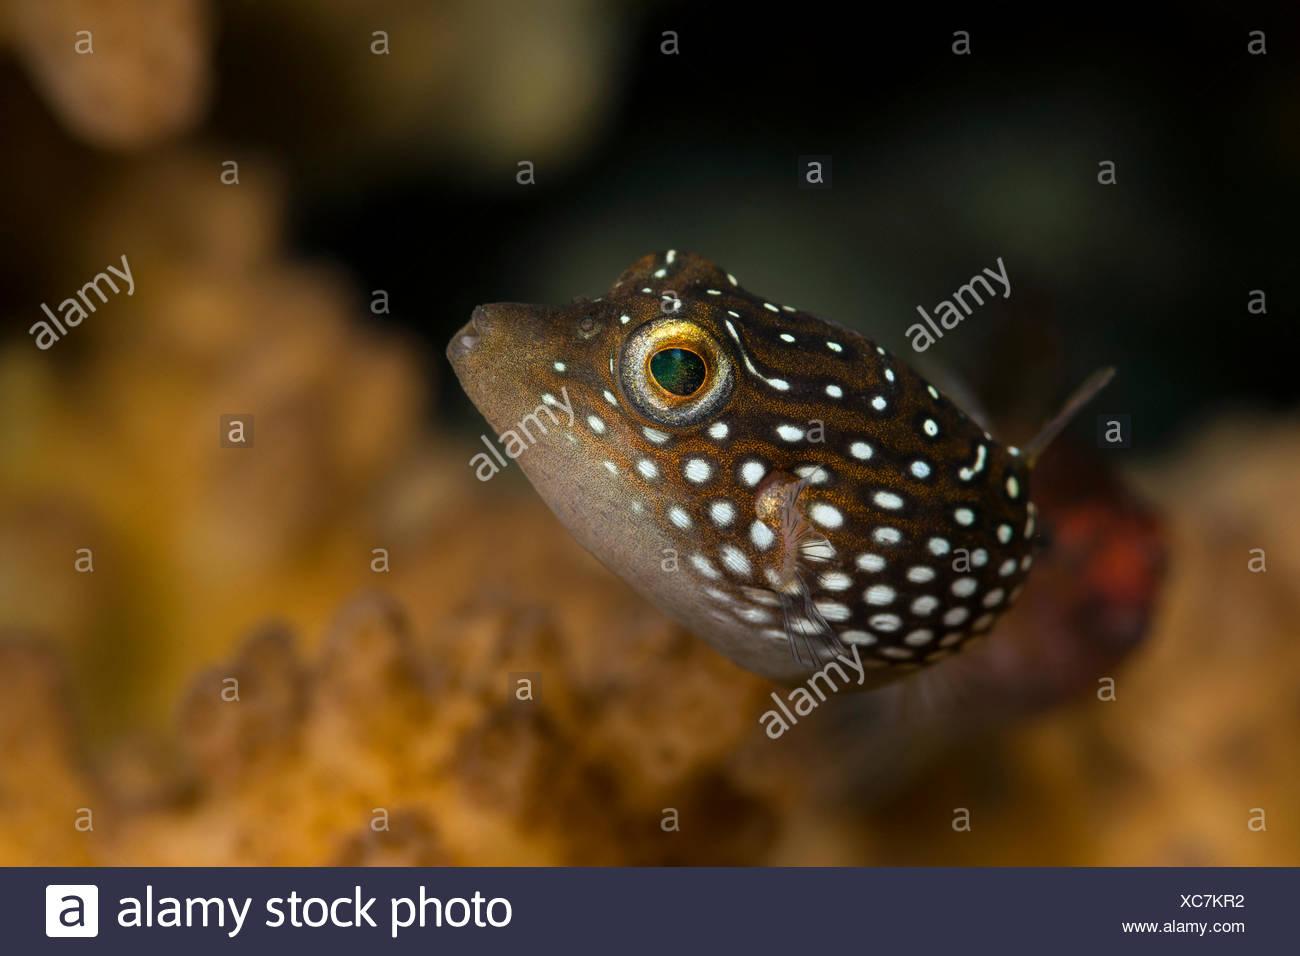 Spotted Sharpnose Puffer, Canthigaster punctatissima, La Paz, Baja California Sur, Mexico Stock Photo